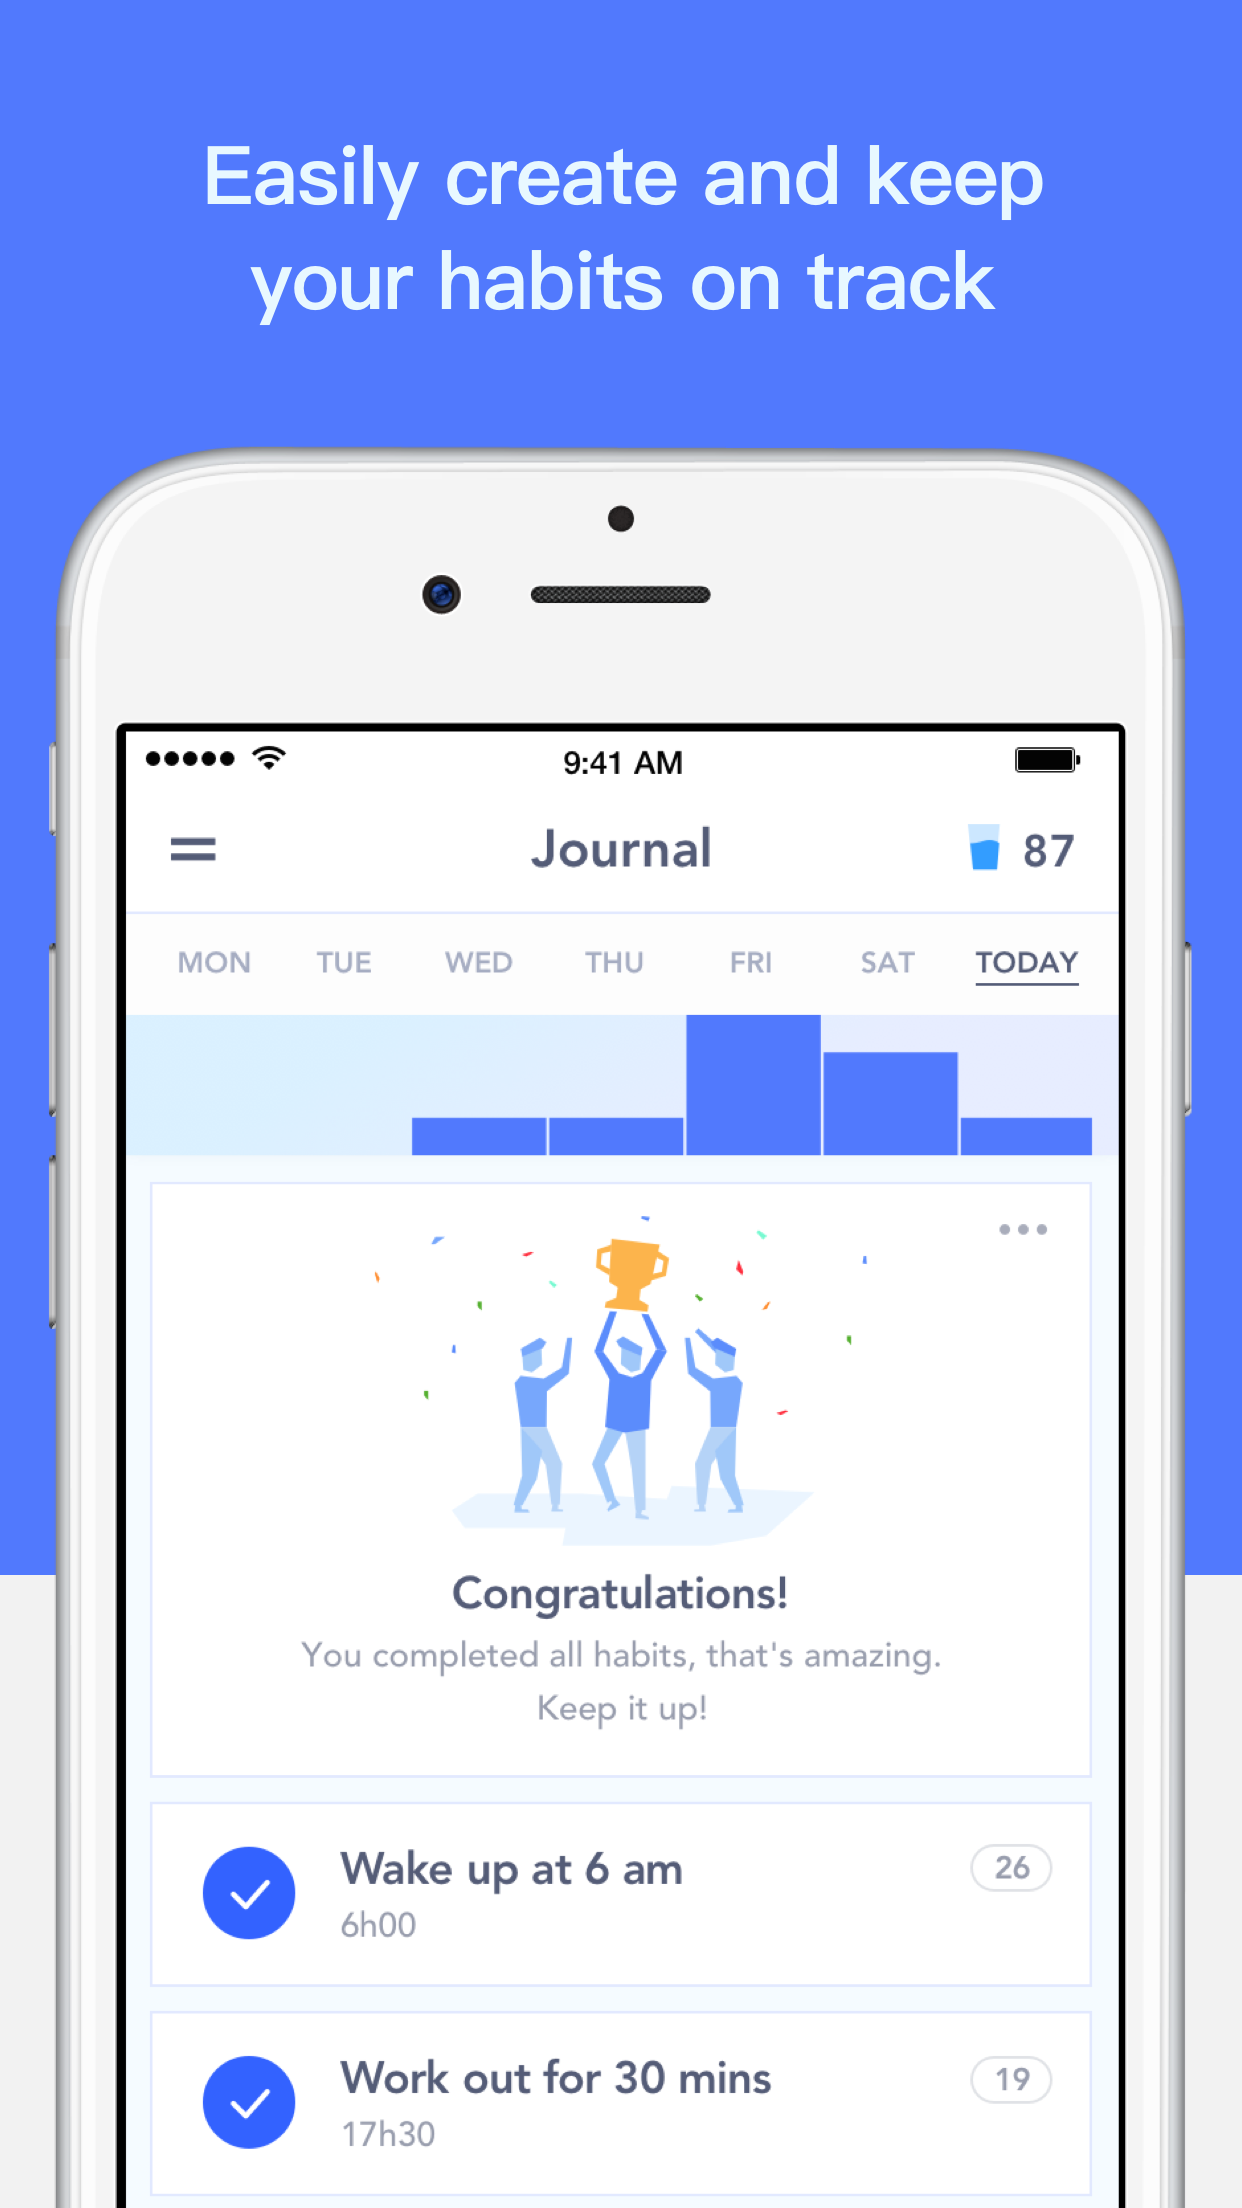 Screenshot - iPhone 6 Plus - Journal.png